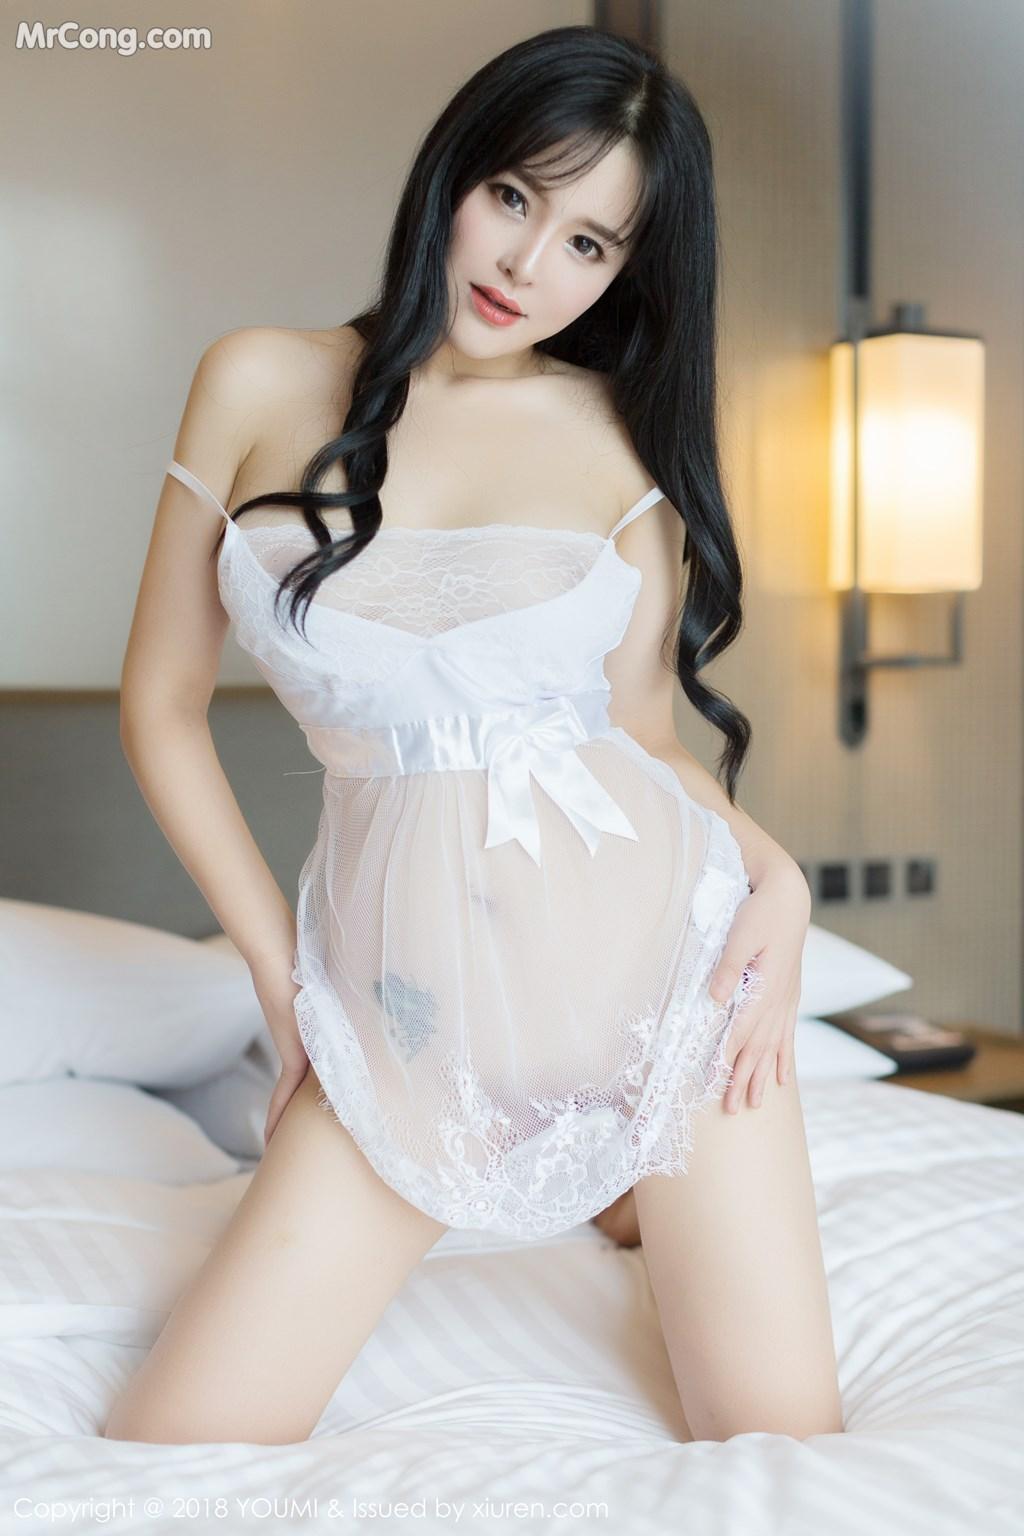 YouMi Vol.238: Model Liu Yu Er (刘 钰 儿) (46 photos)